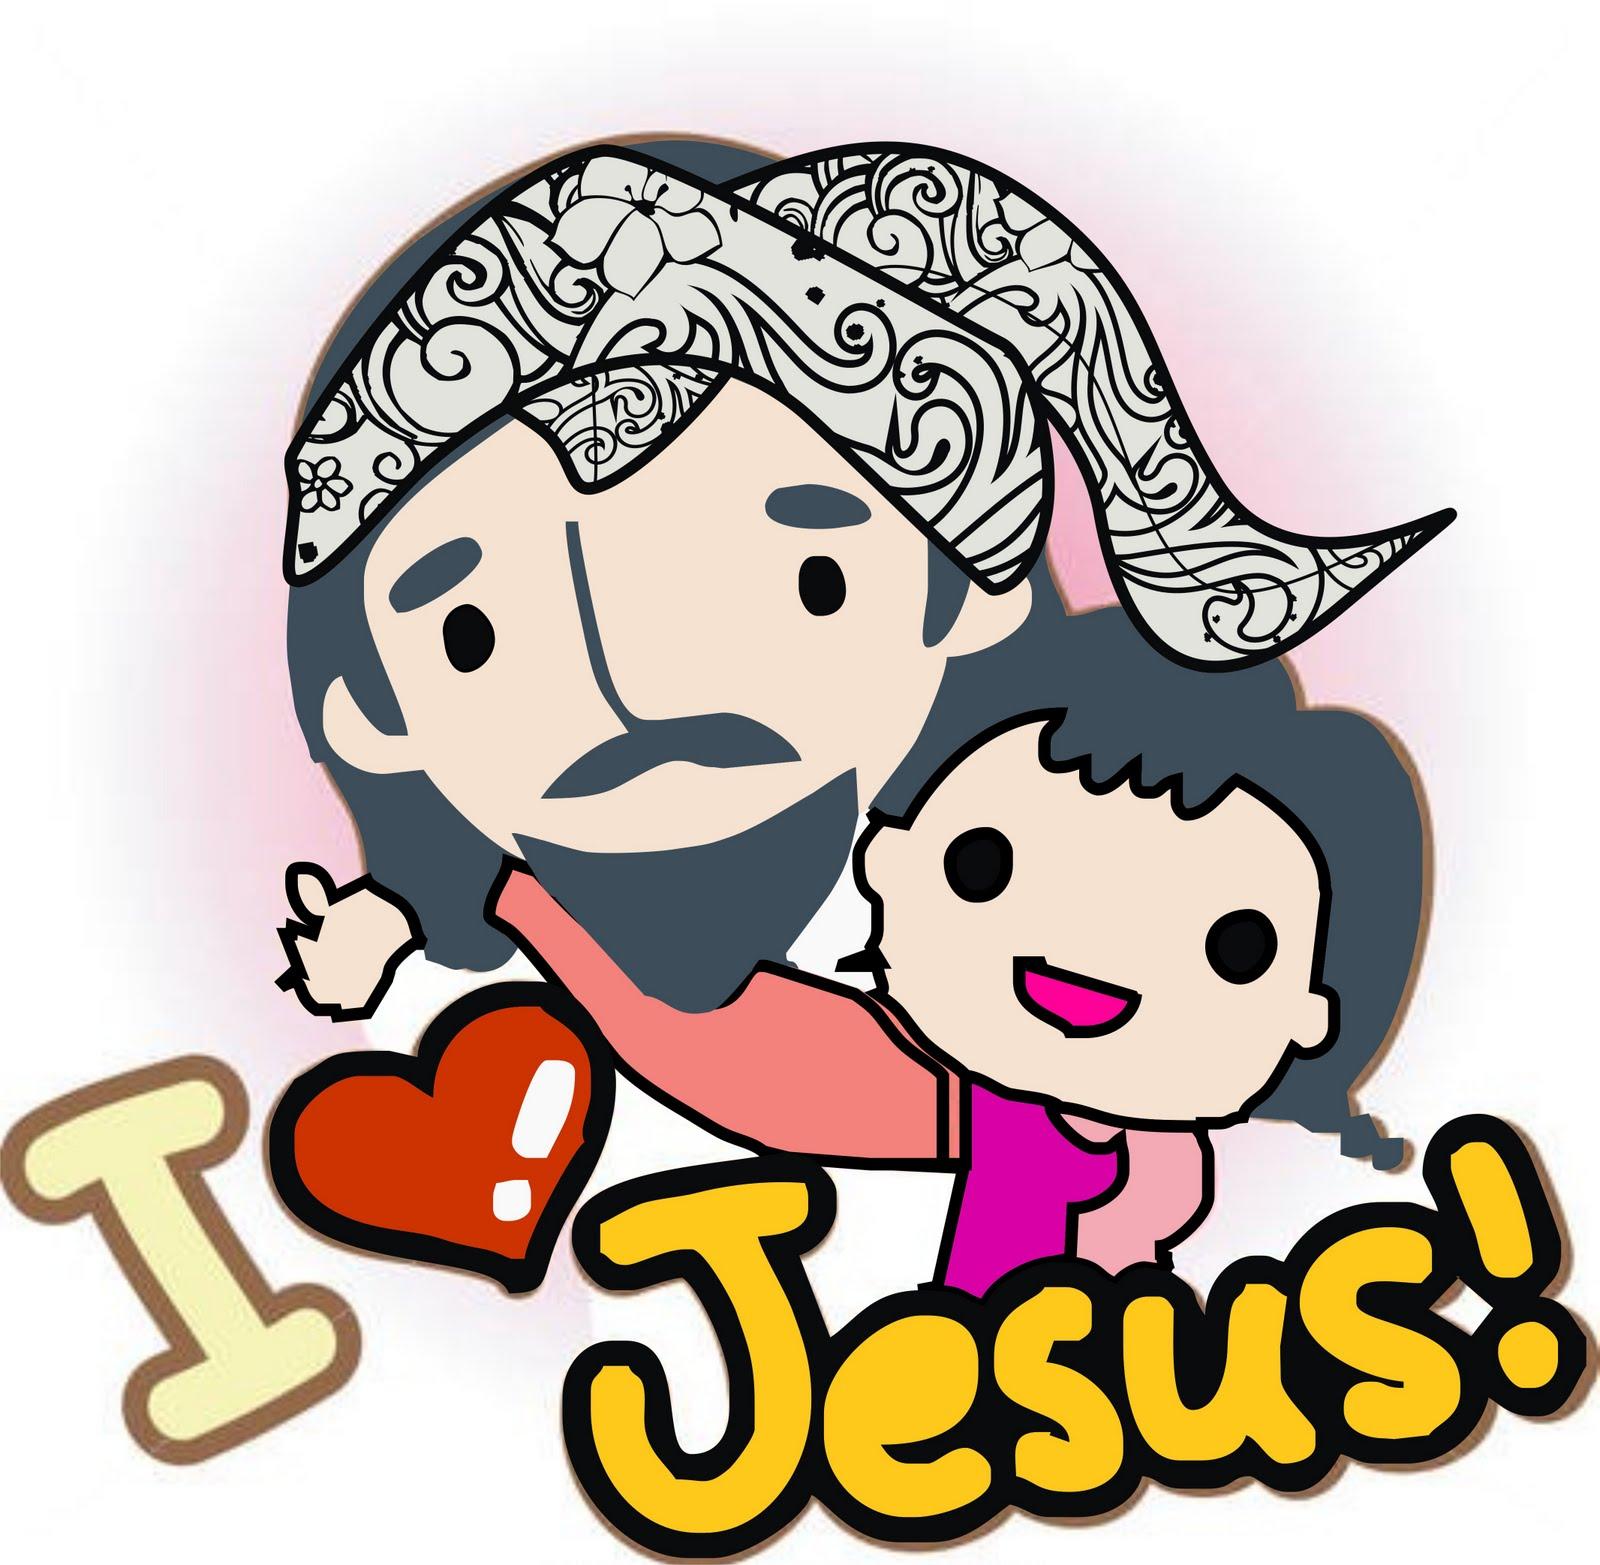 1600x1565 Cool Design Cartoon Clipart Jesus Free Download Clip Art